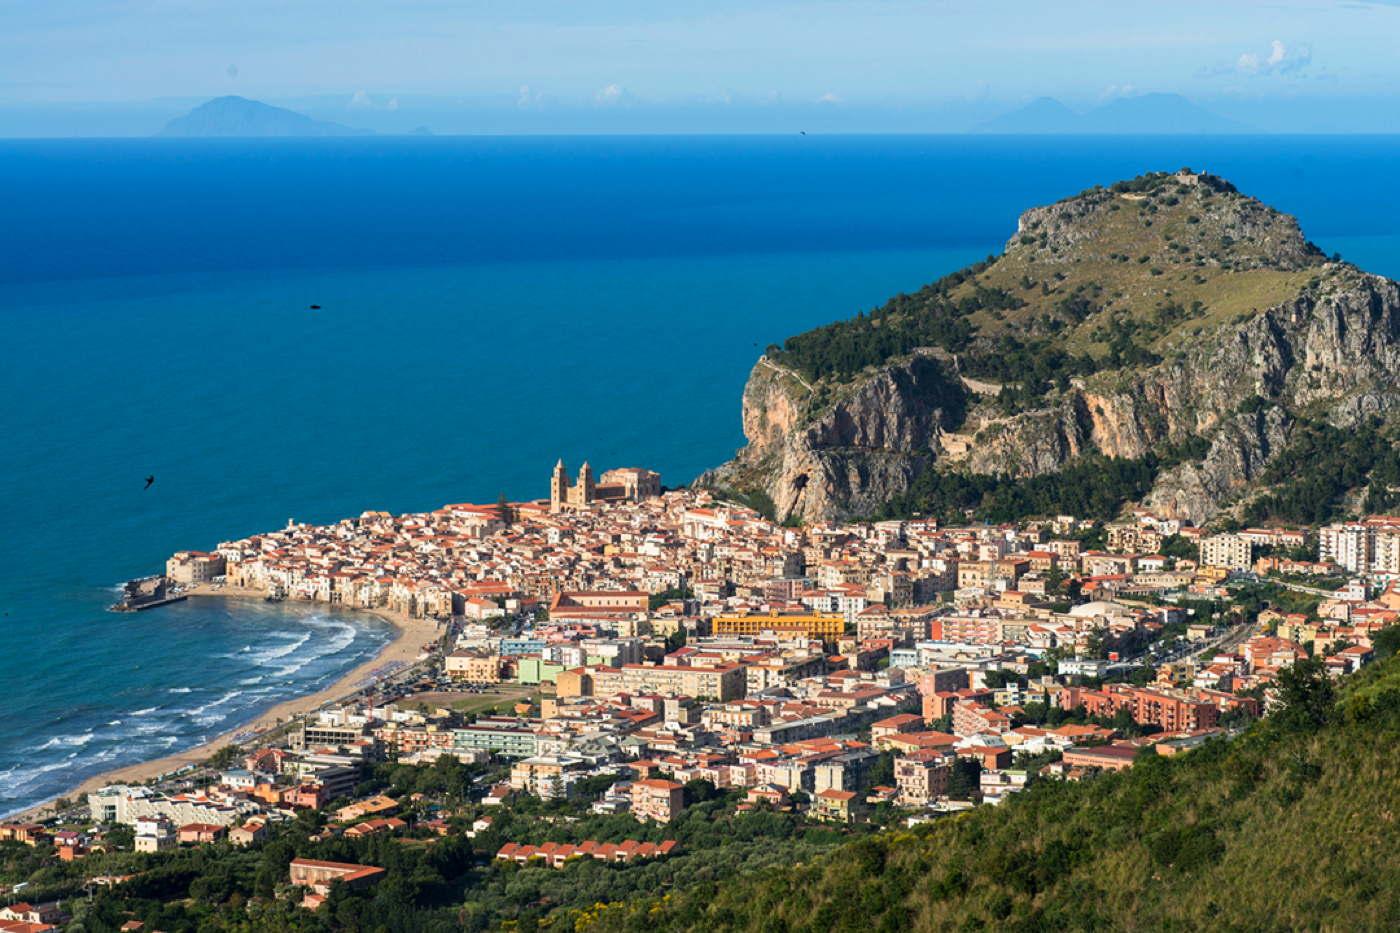 Ferienvilla Cefalu Mieten Mit Meerblick Und Pool Sizilien Italien